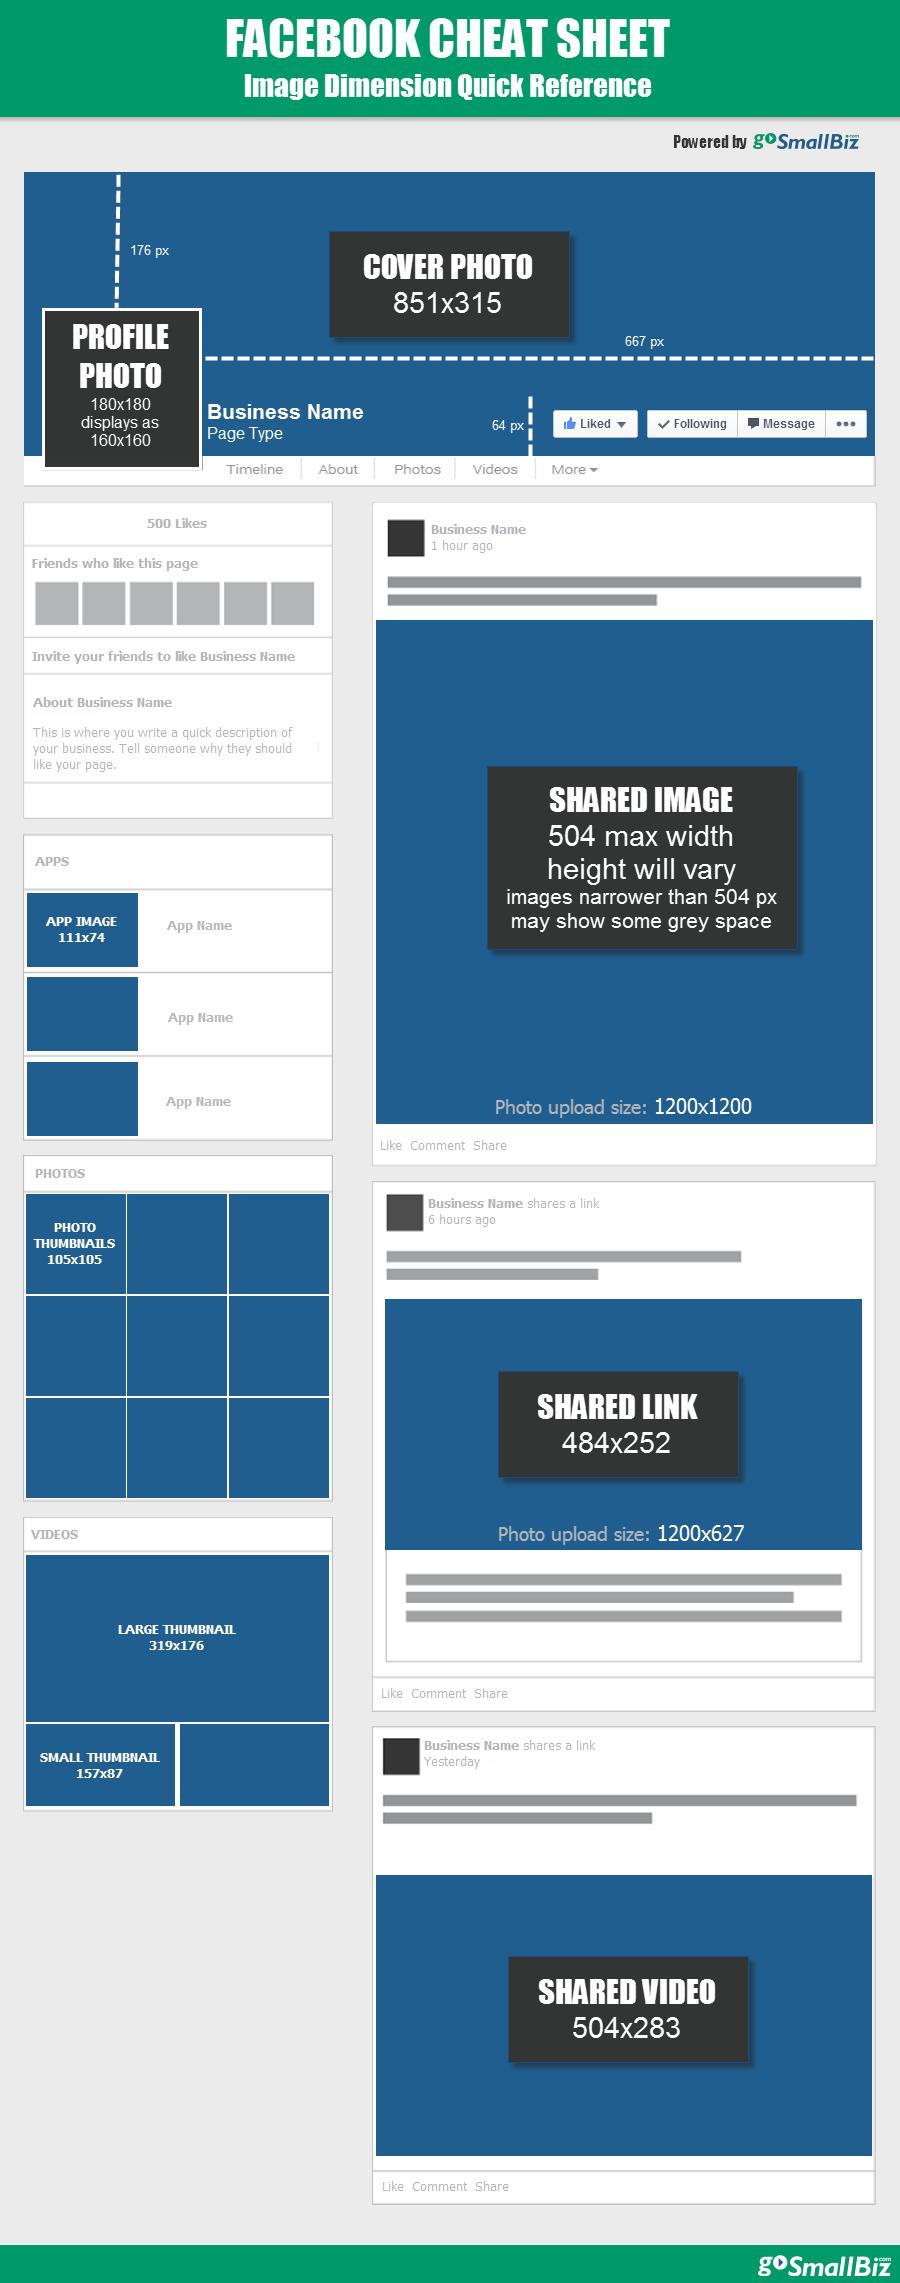 2014 Facebook Image Dimension Guide – GoSmallBiz com